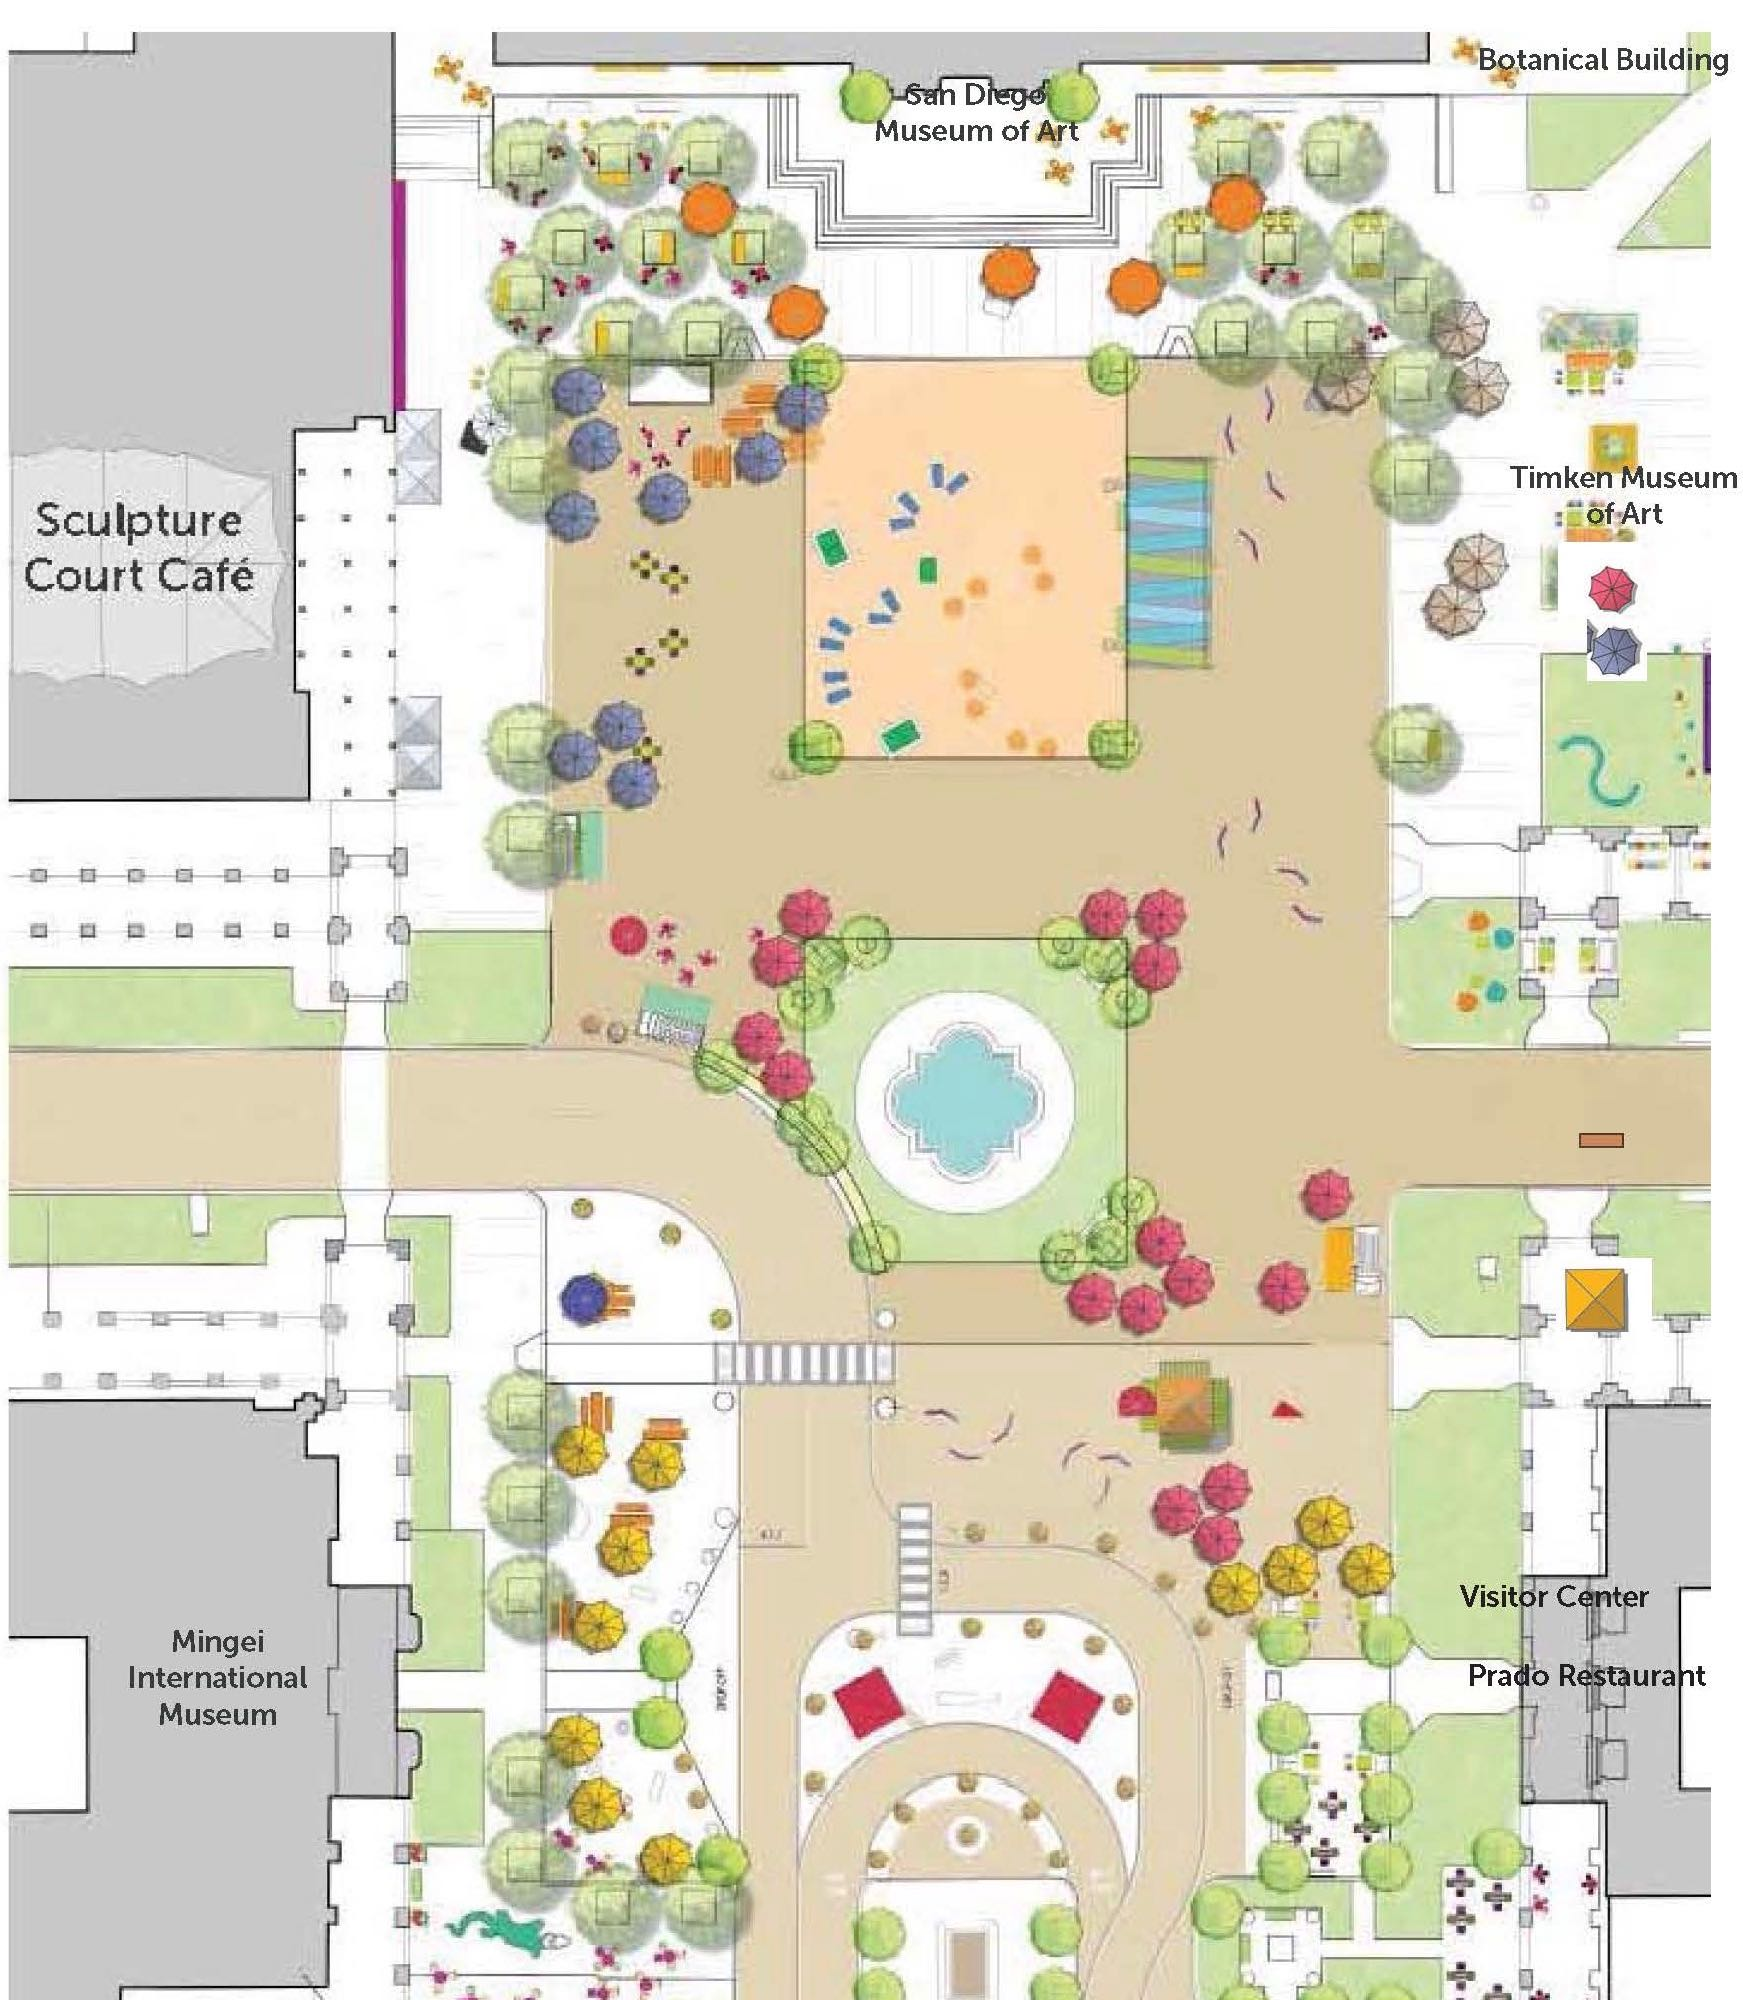 Plaza de Panama, Balboa Park